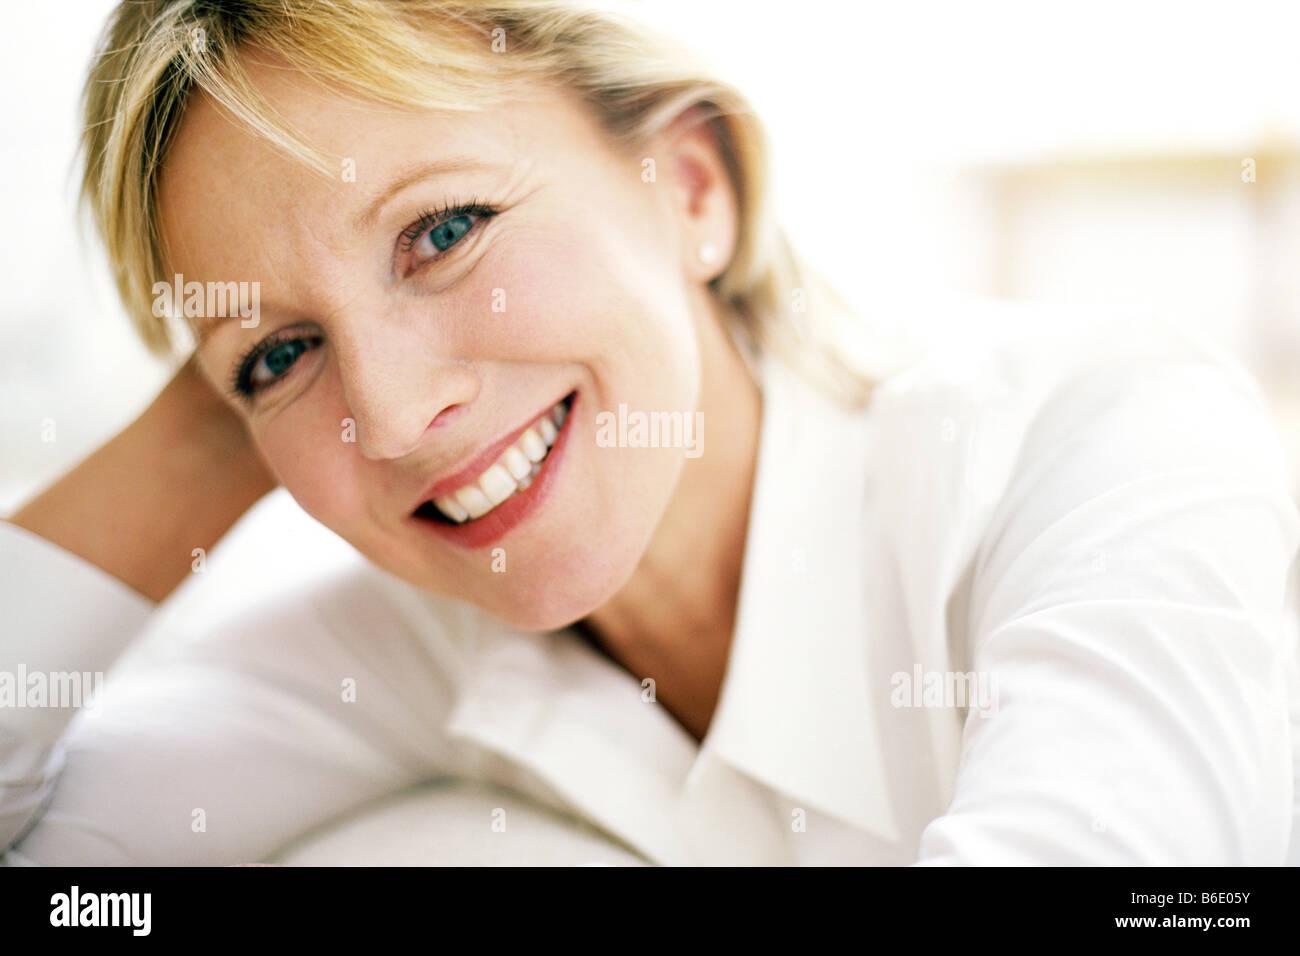 Portrait 48 Year Old Woman Stockfotos & Portrait 48 Year